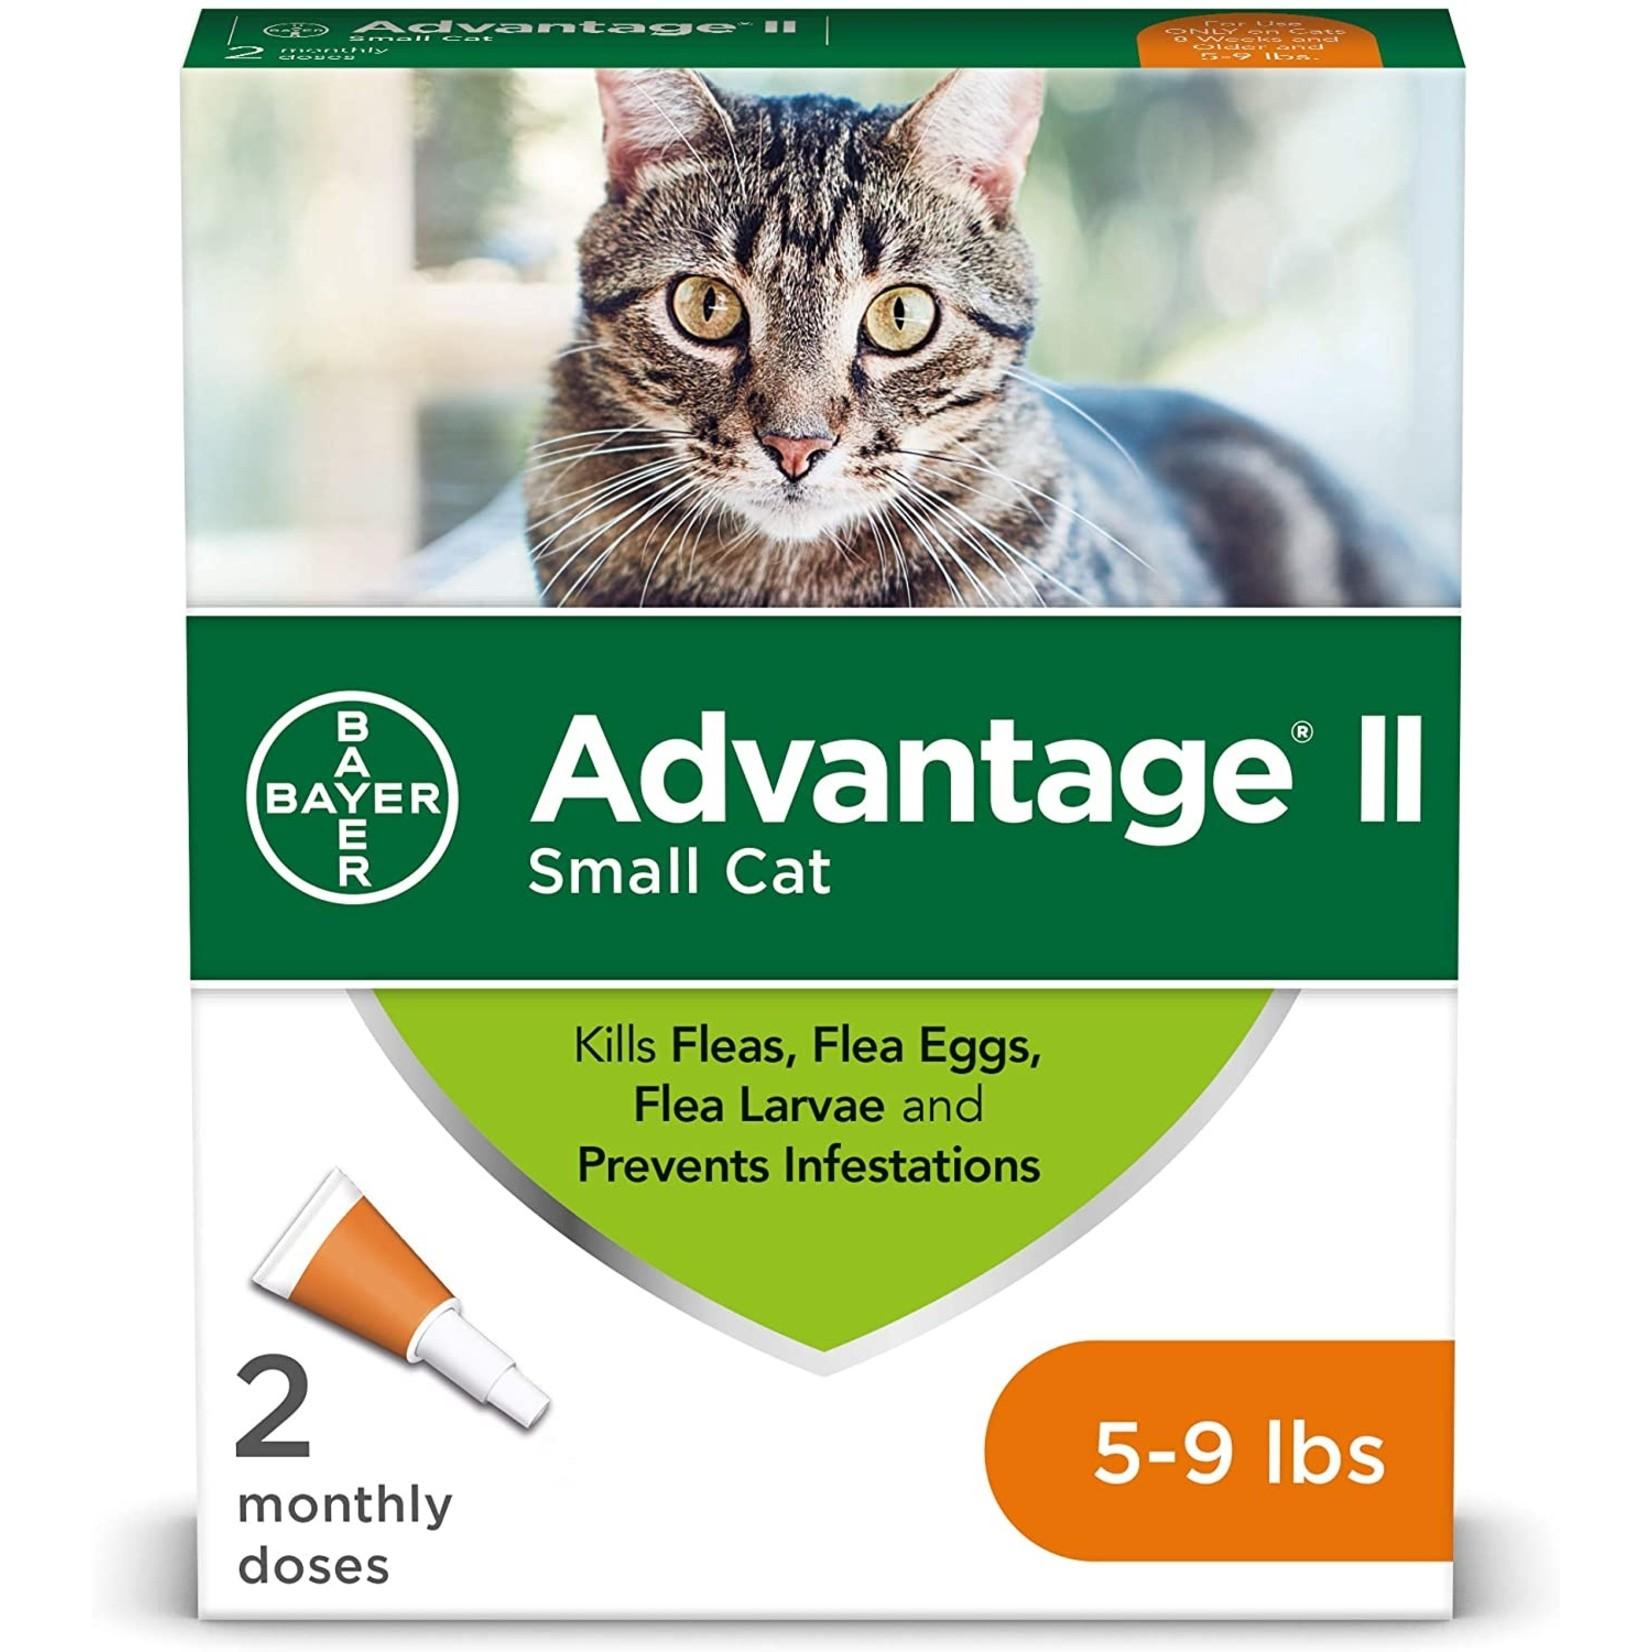 Bayer K9 Advantage Tick & Flea Drops For Cats 2 Dosage